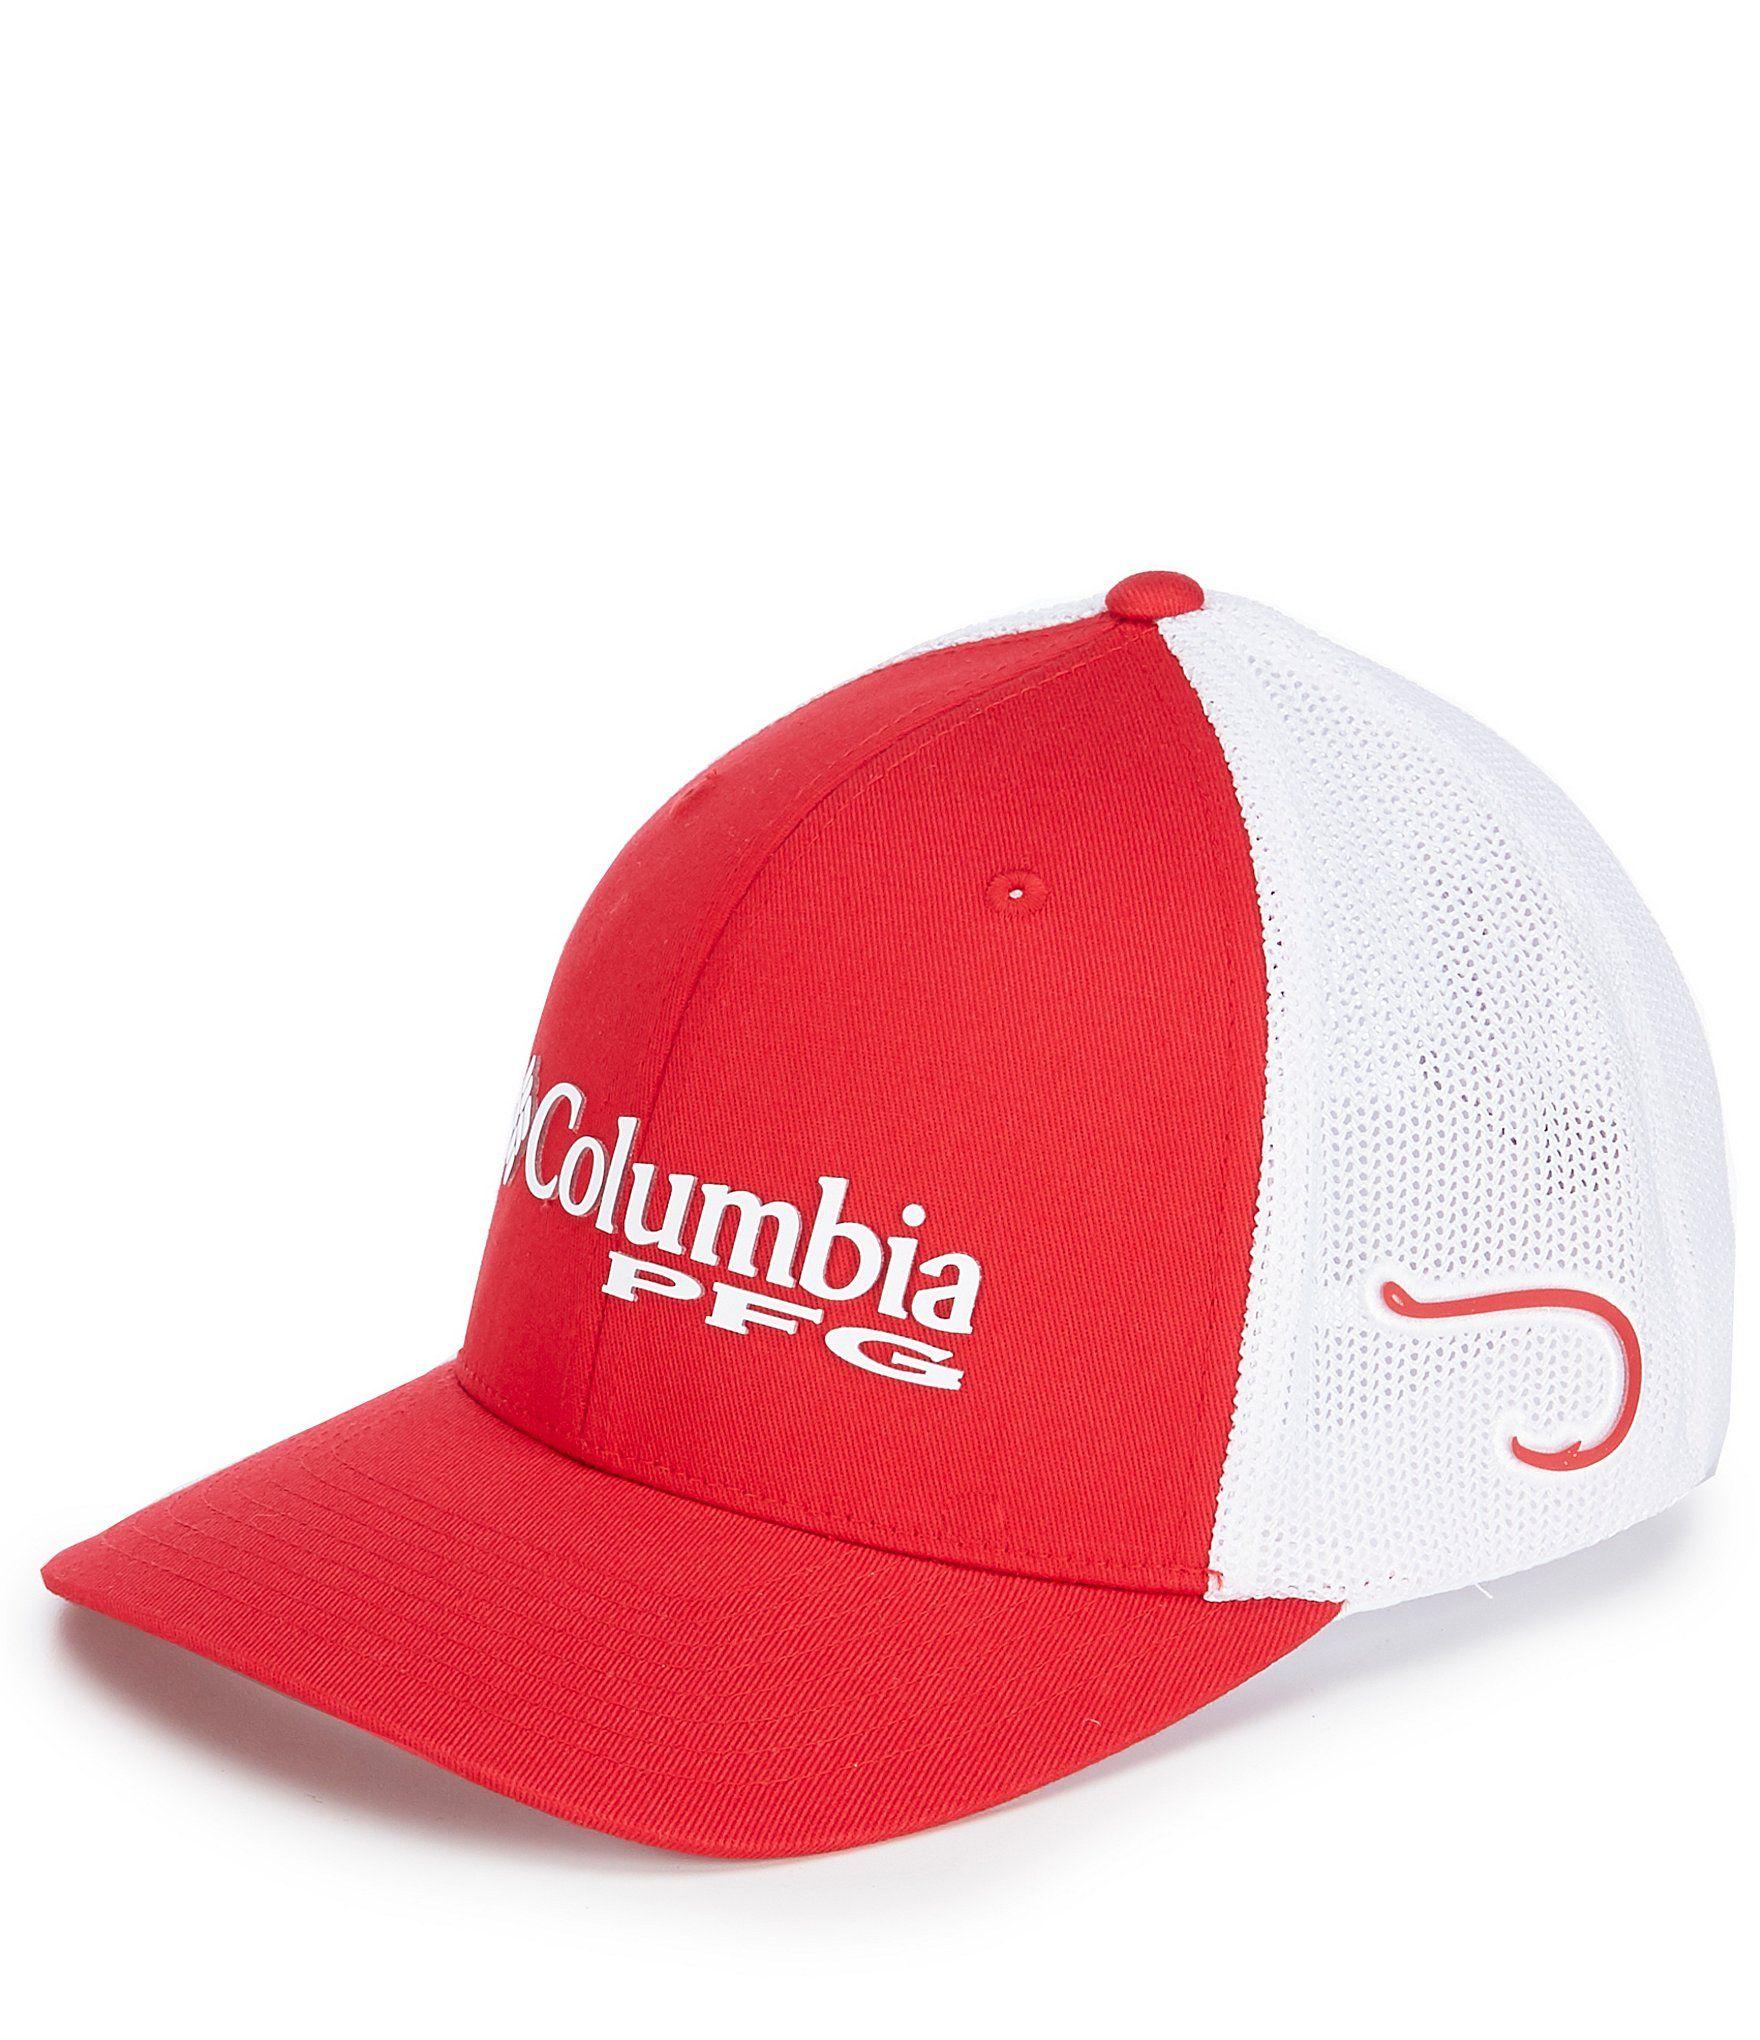 Columbia Pfg Mesh Trucker Cap Dillard S In 2021 Country Hats Columbia Columbia Hat